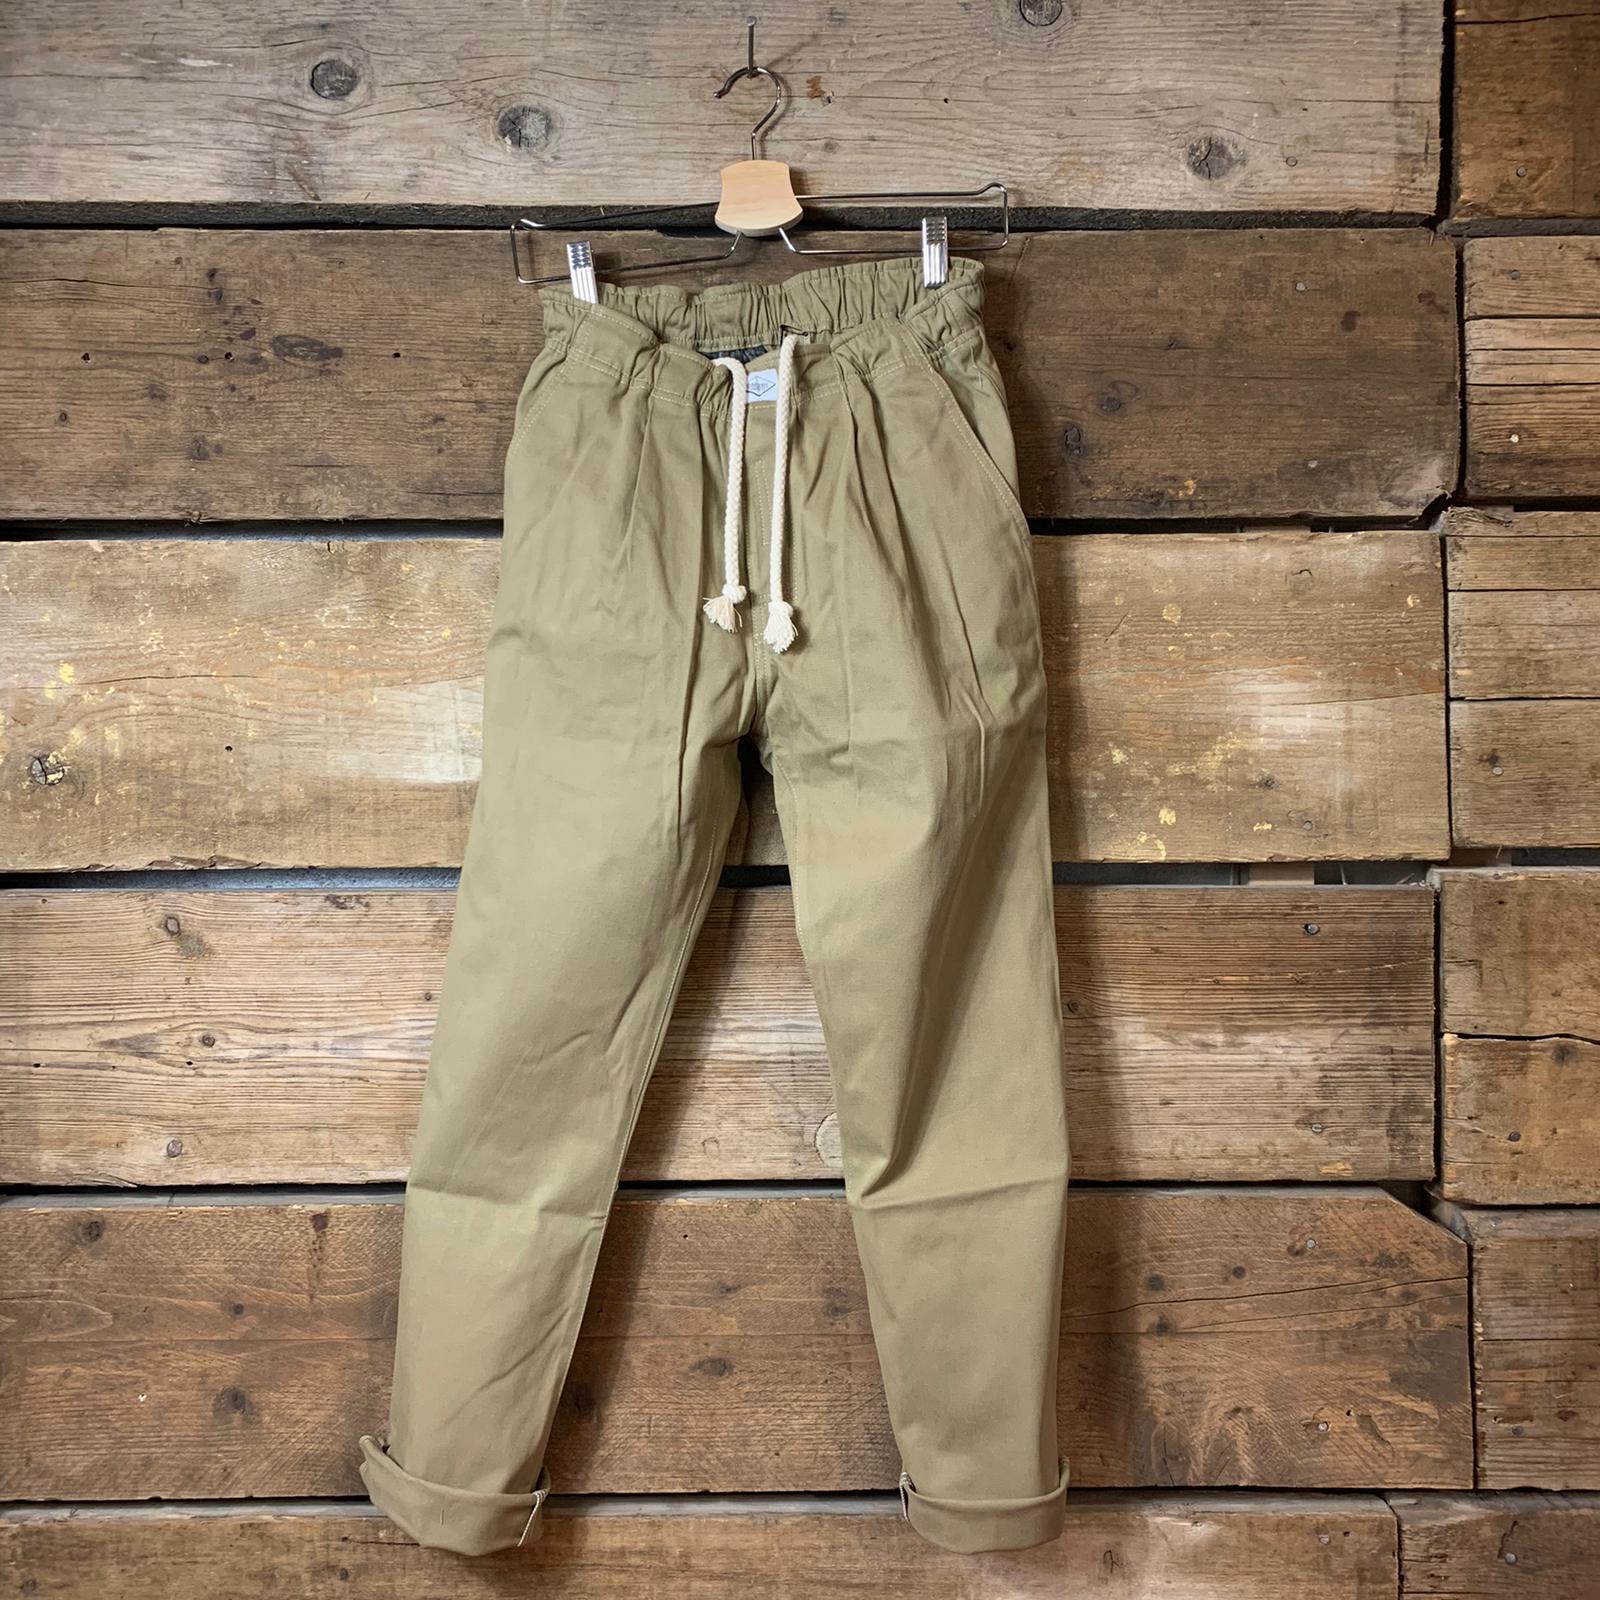 Pantalone Bakery Lowan Gabardine Beige